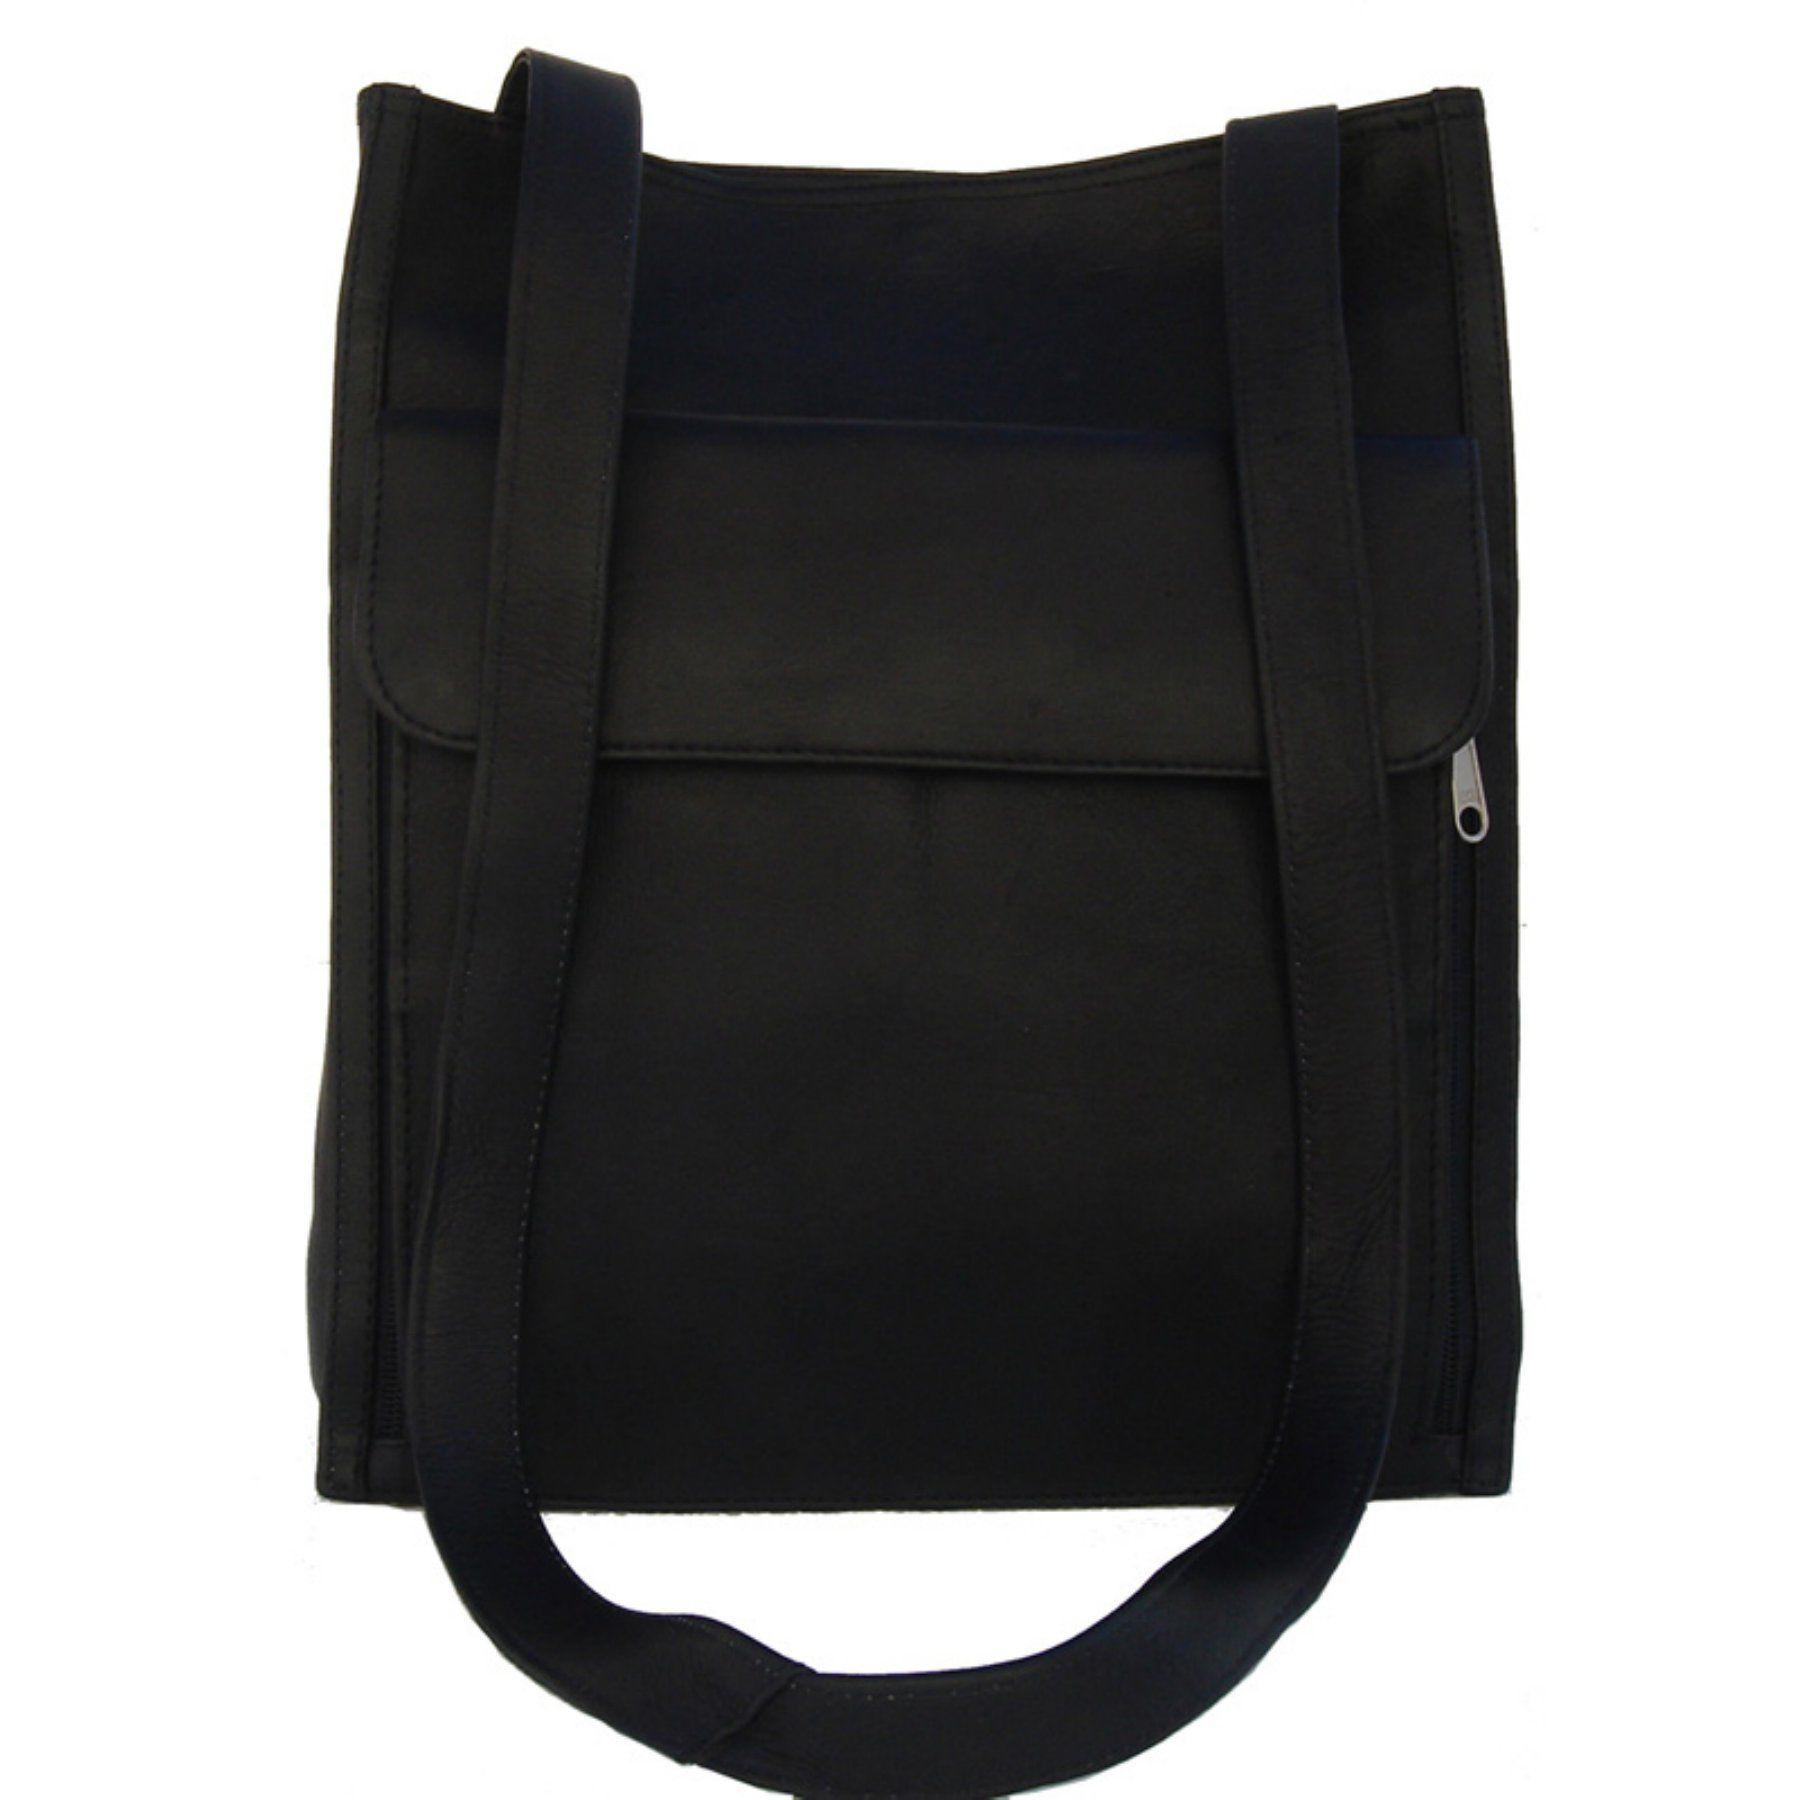 Piel Leather Shoulder Tote Organizer - Black, Women's - 7774-BLK